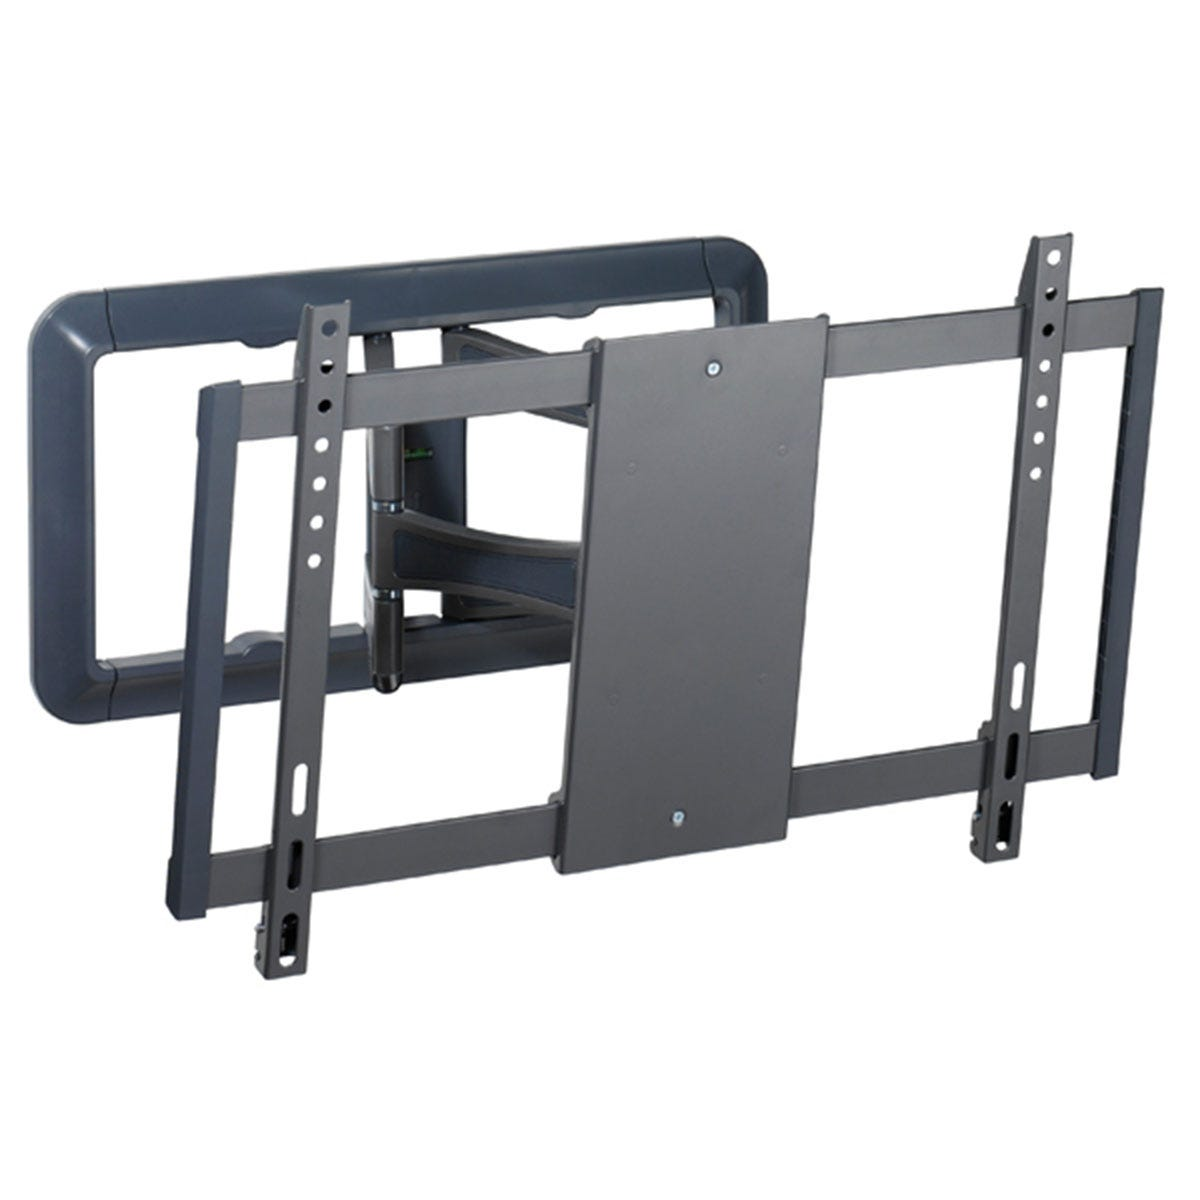 Vivanco BFMO 8060 Titan Full Motion TV Wallmount 85